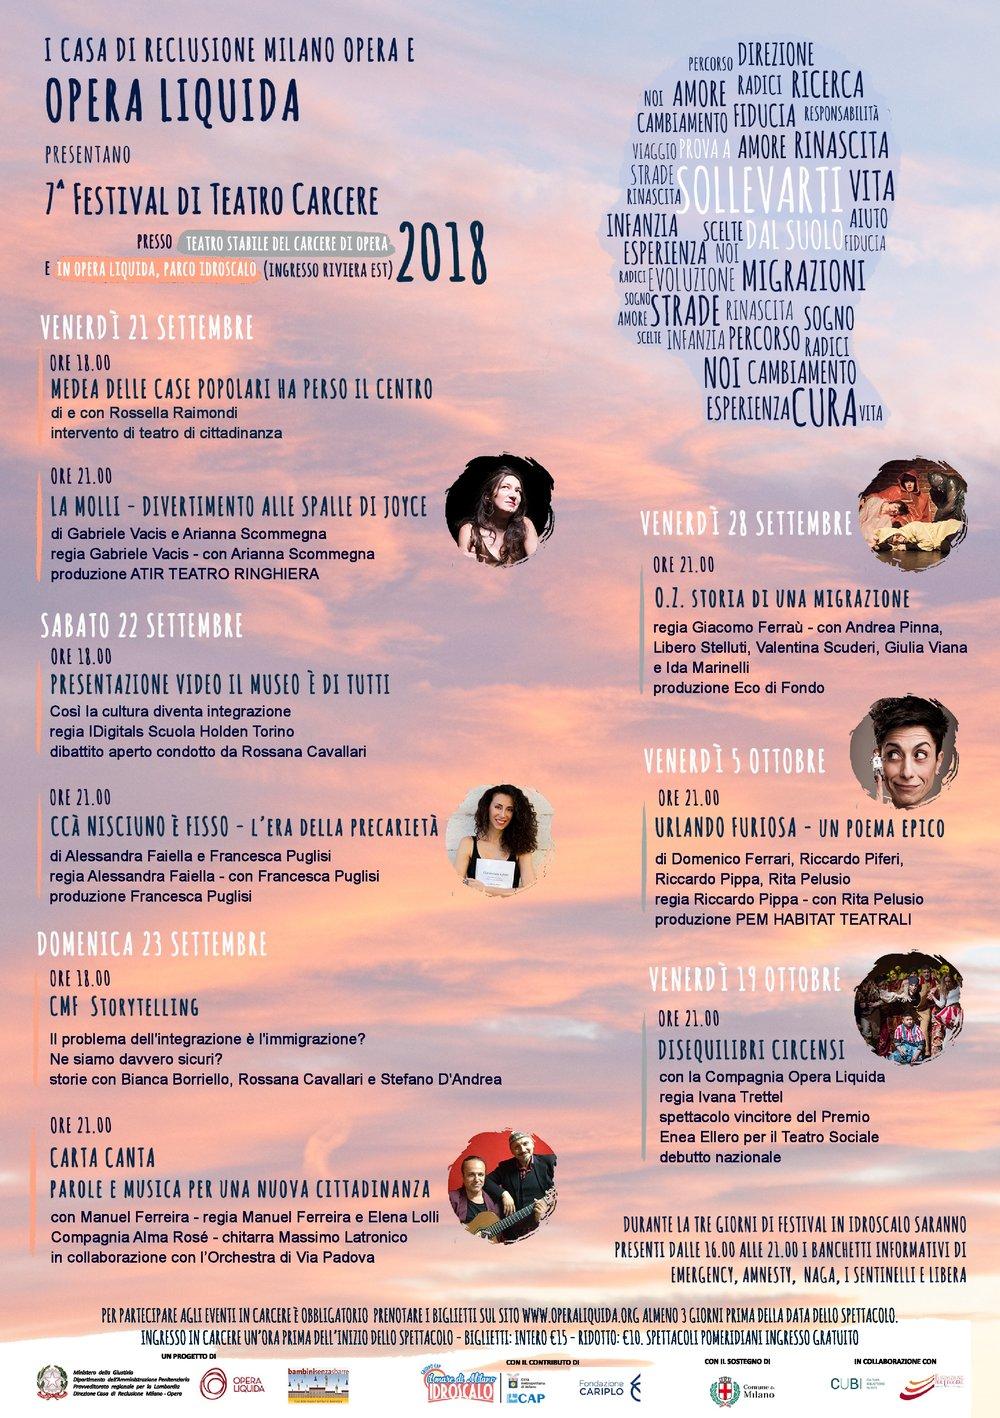 locandina festival opera liquida-001.jpg